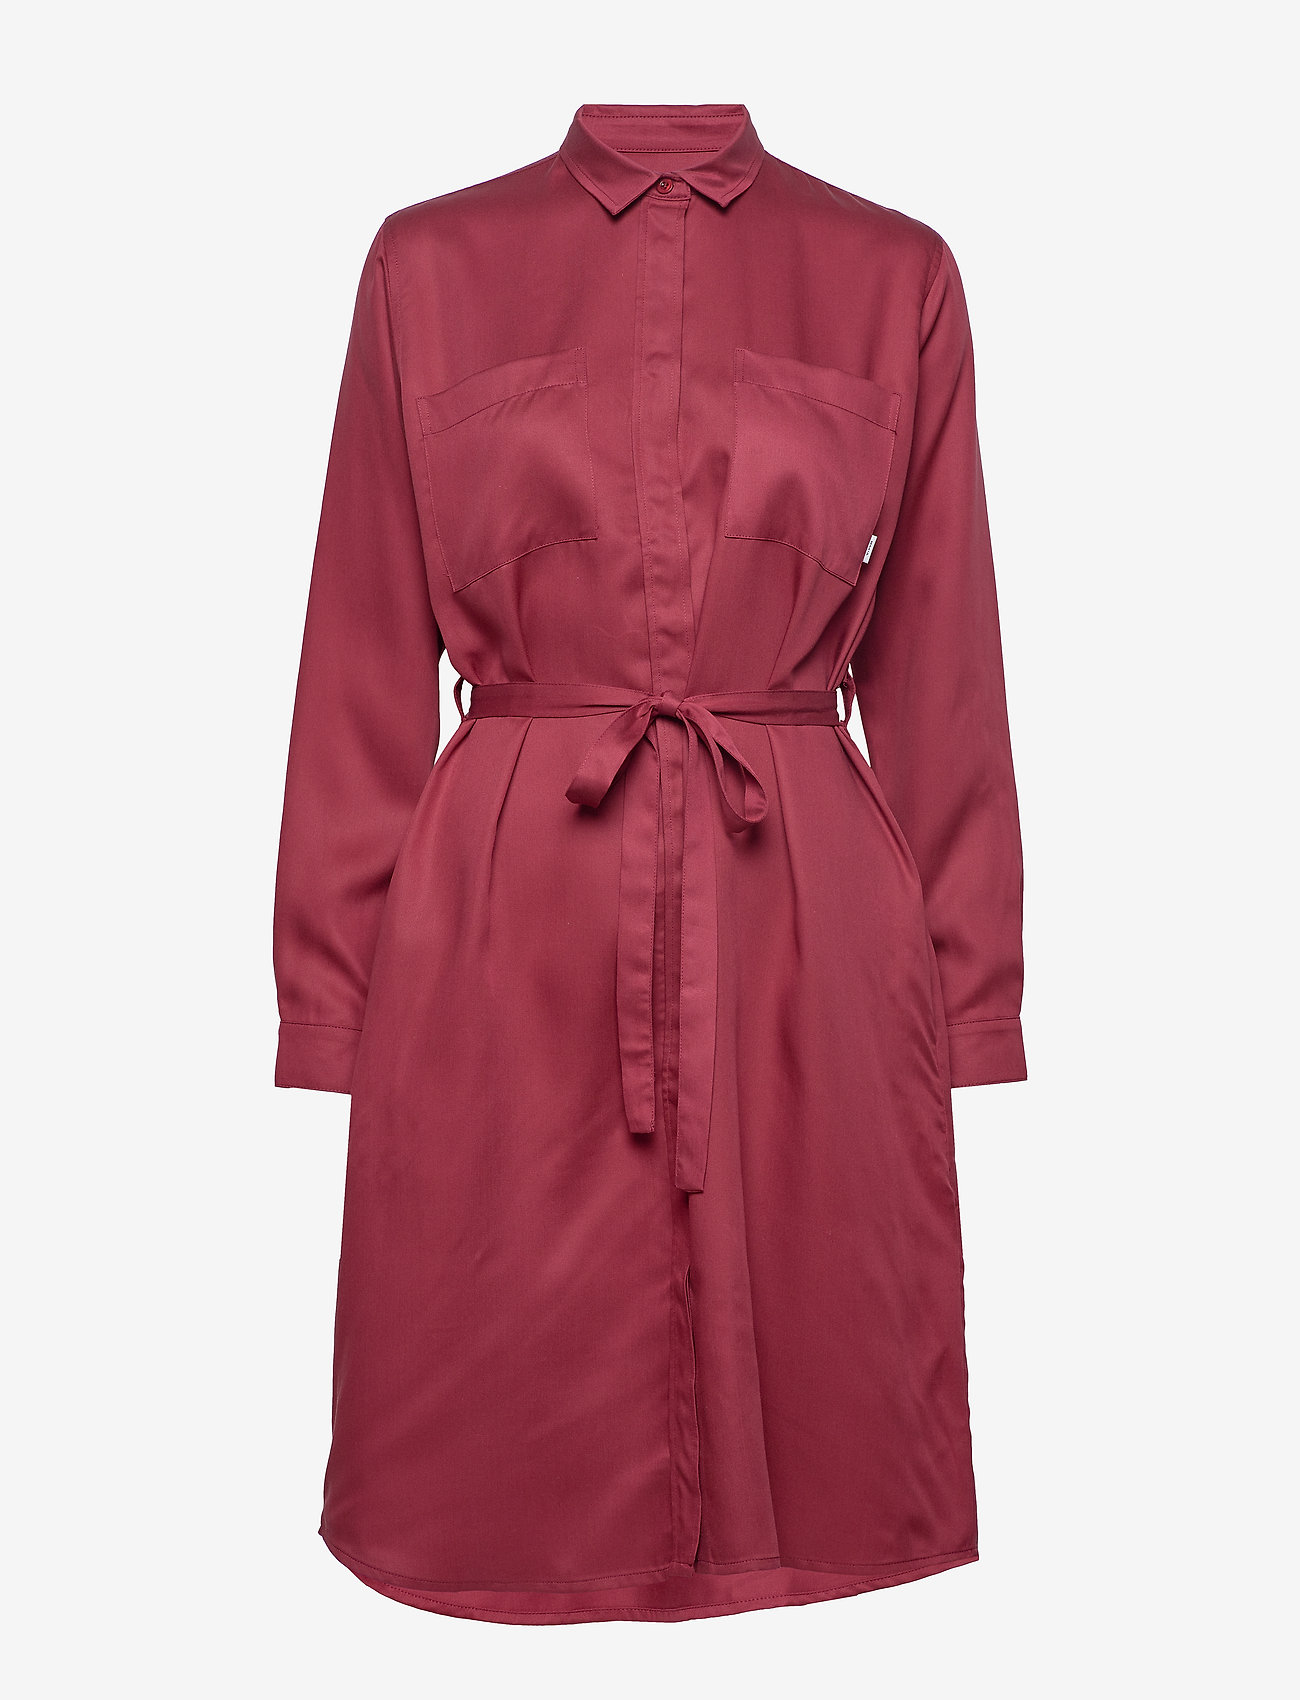 Makia Aava Dress- Robes cxKNlphX 6tTvh tcNVqlcm